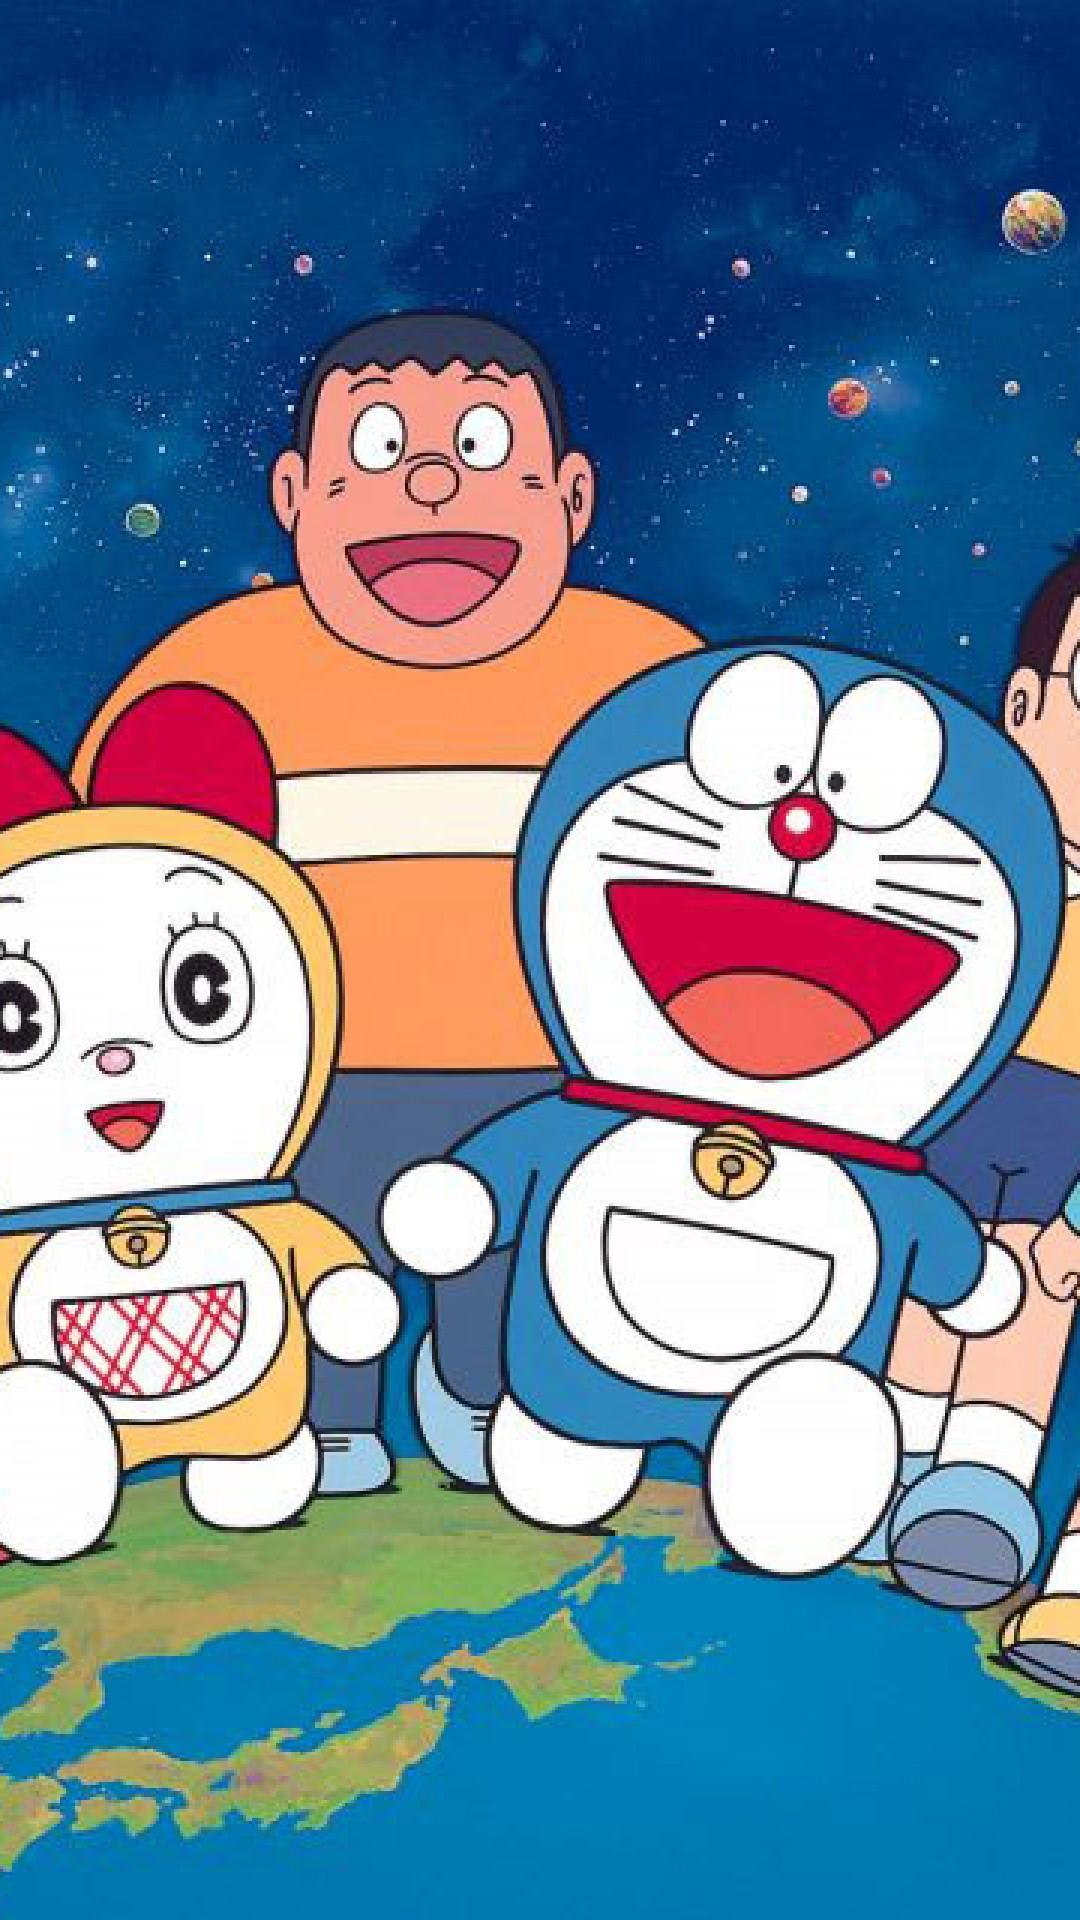 Doraemon Full HD iPhone Wallpapers - Wallpaper Cave